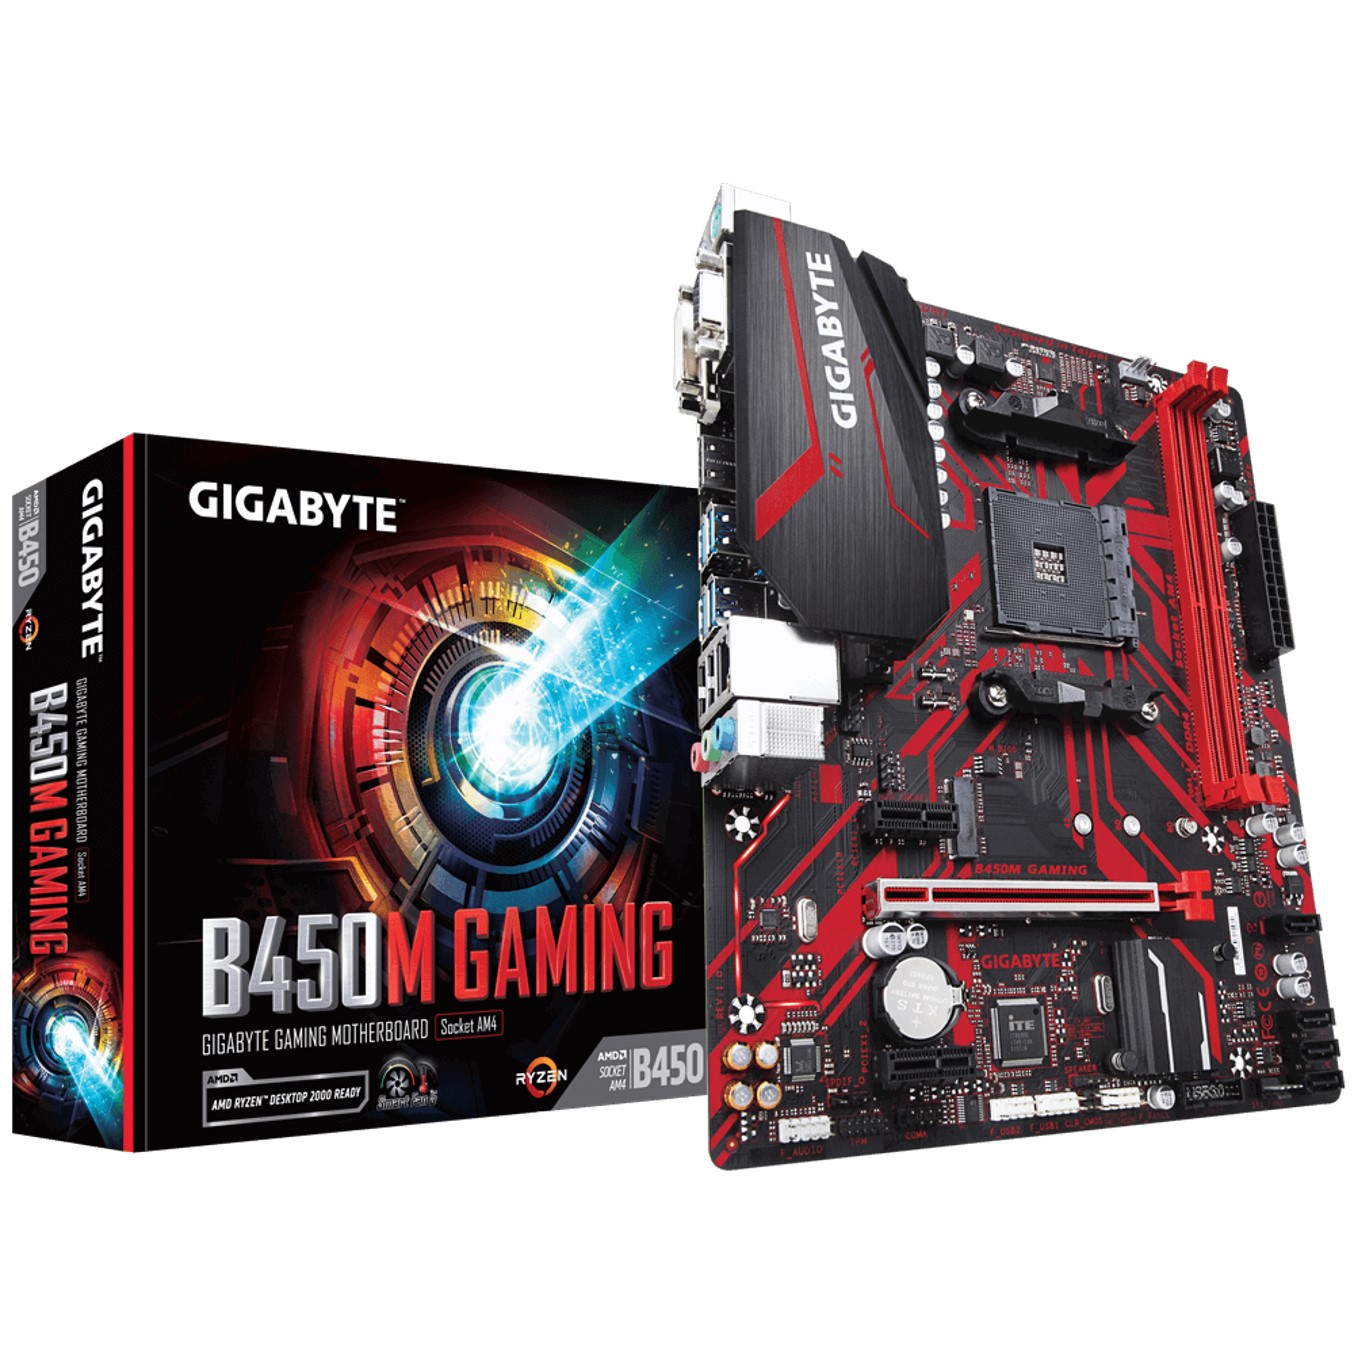 PLACA BASE GIGABYTE AMD B450M GAMING DDR4X2 32GB VGA